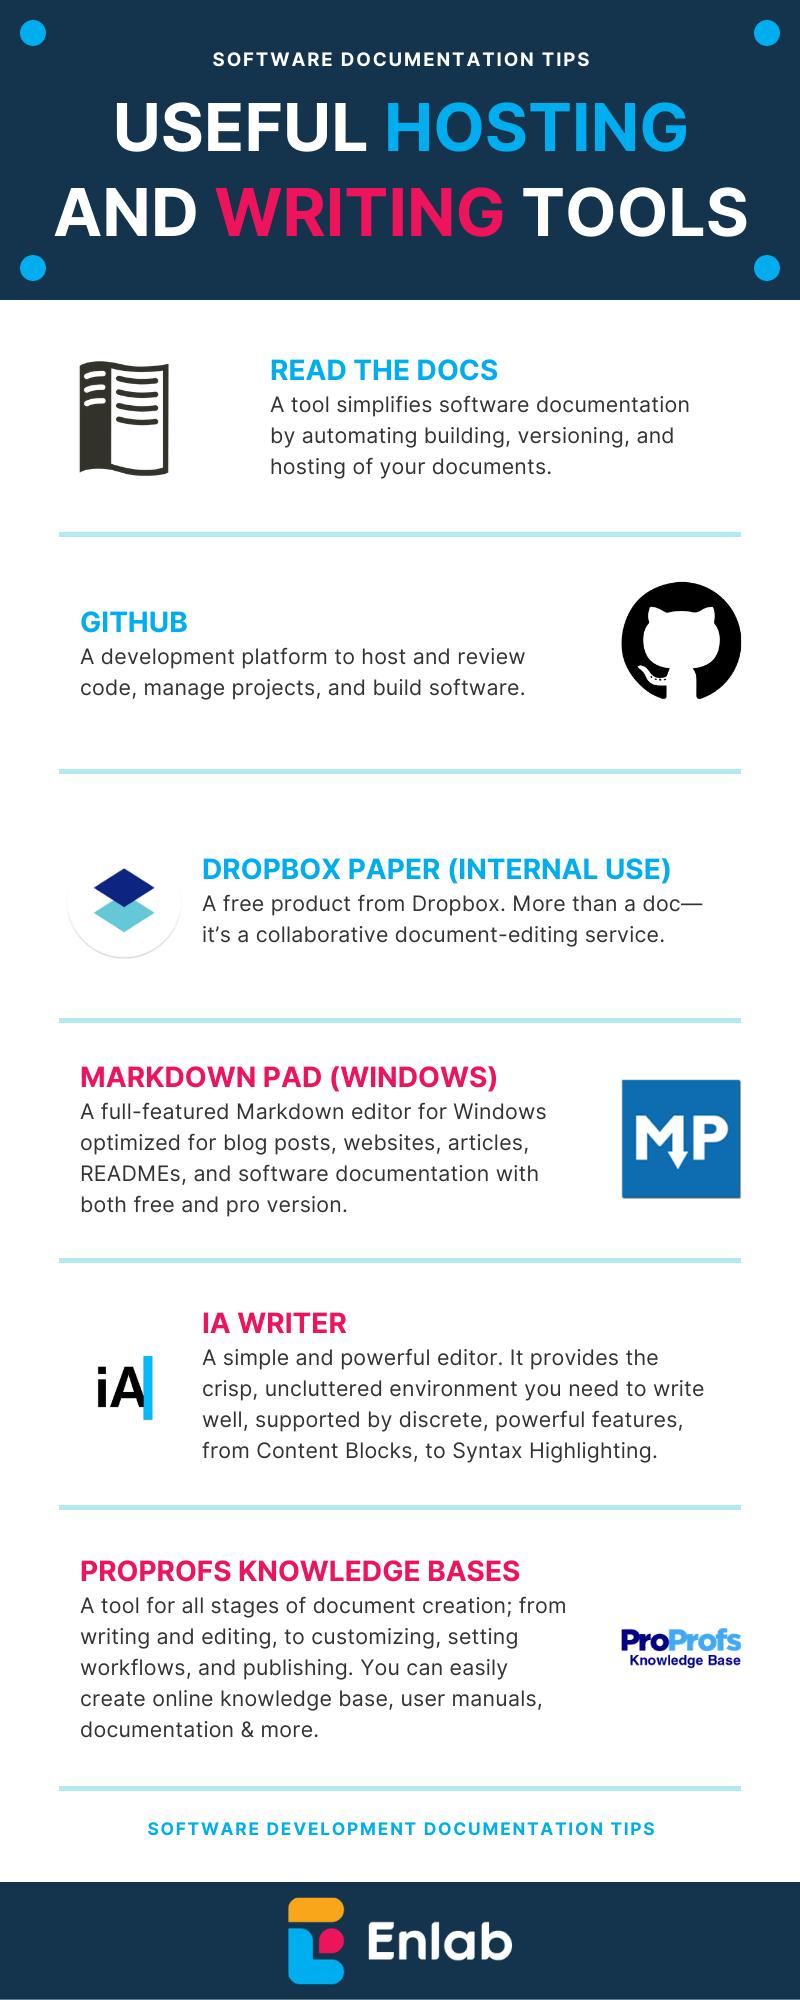 Blog Documentation Tips